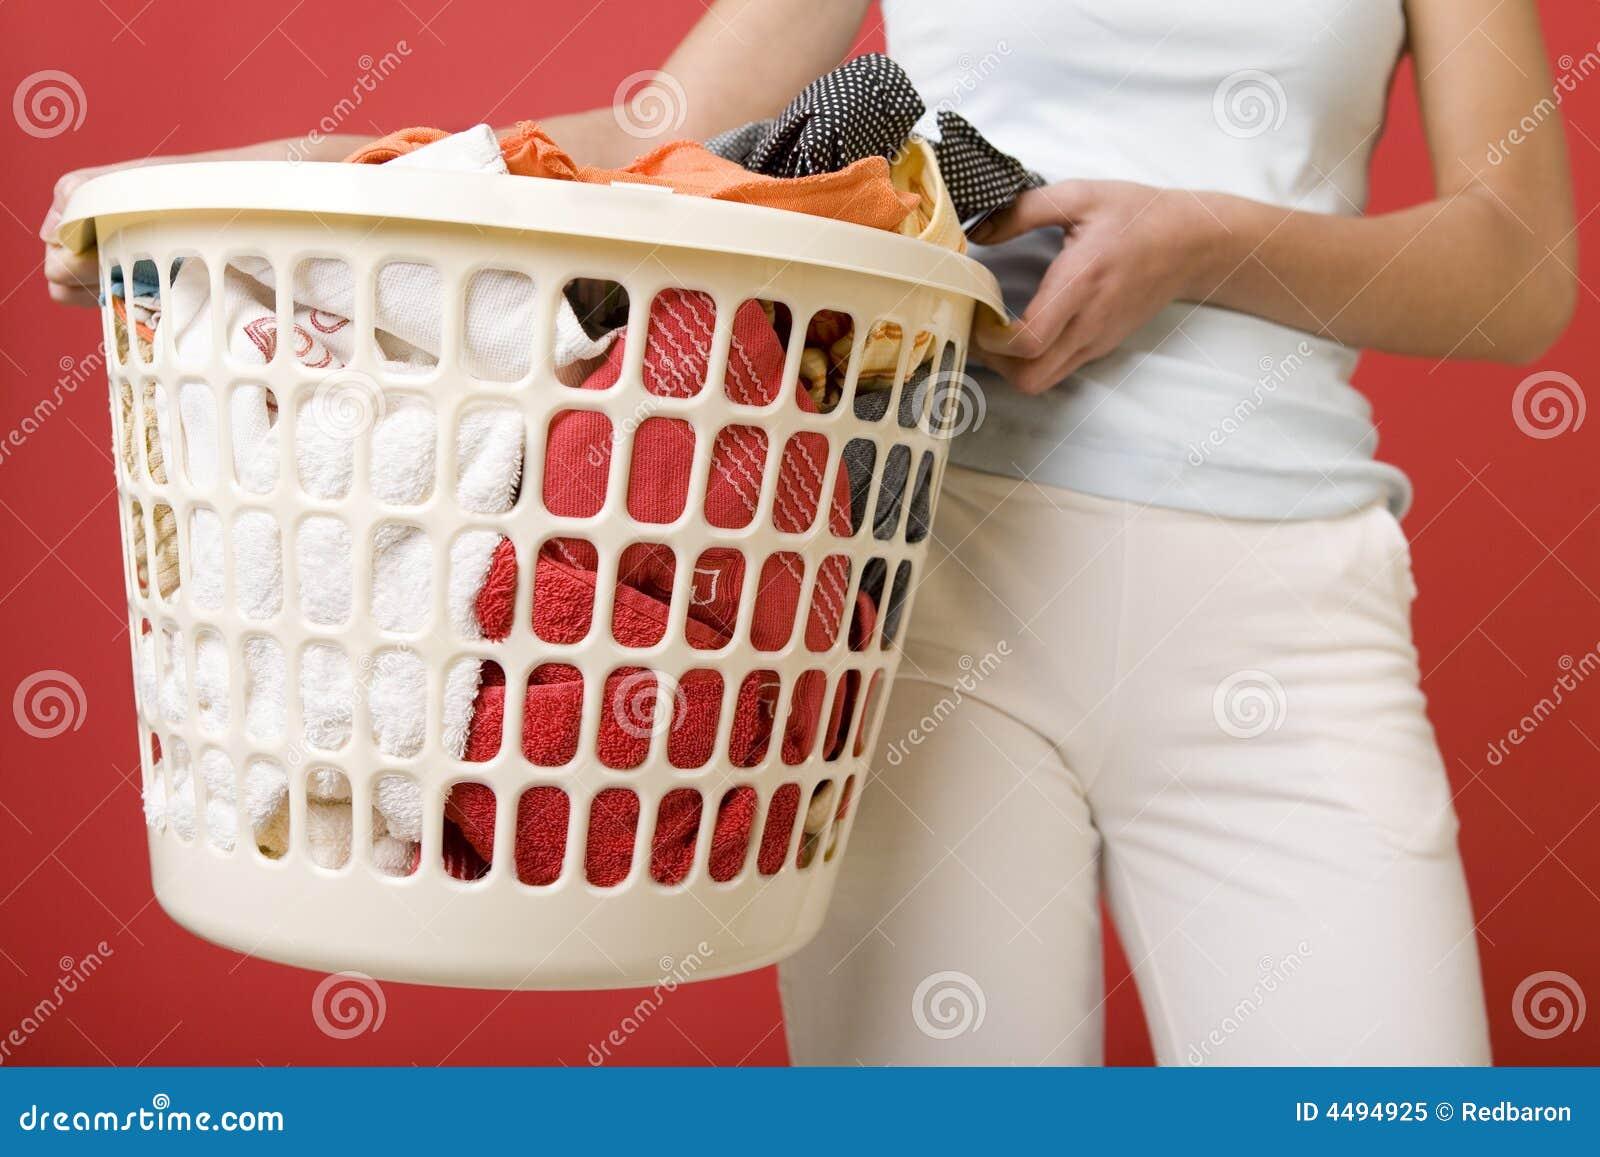 Clothing to the washing.